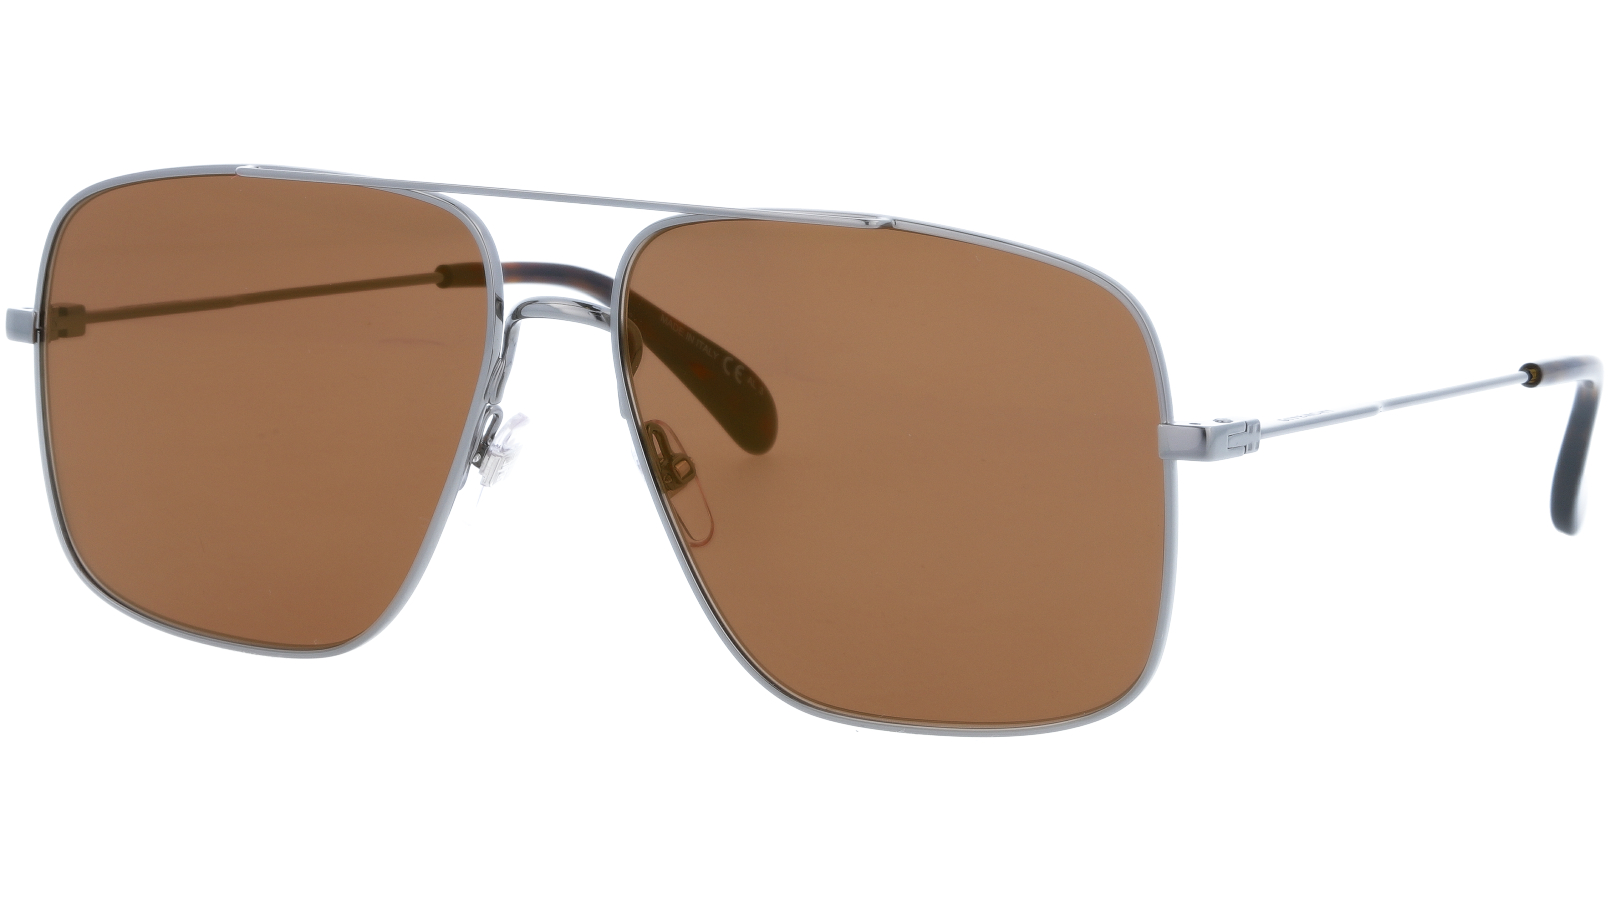 GIVENCHY GV7119S KJ1VP 61 DARK Sunglasses